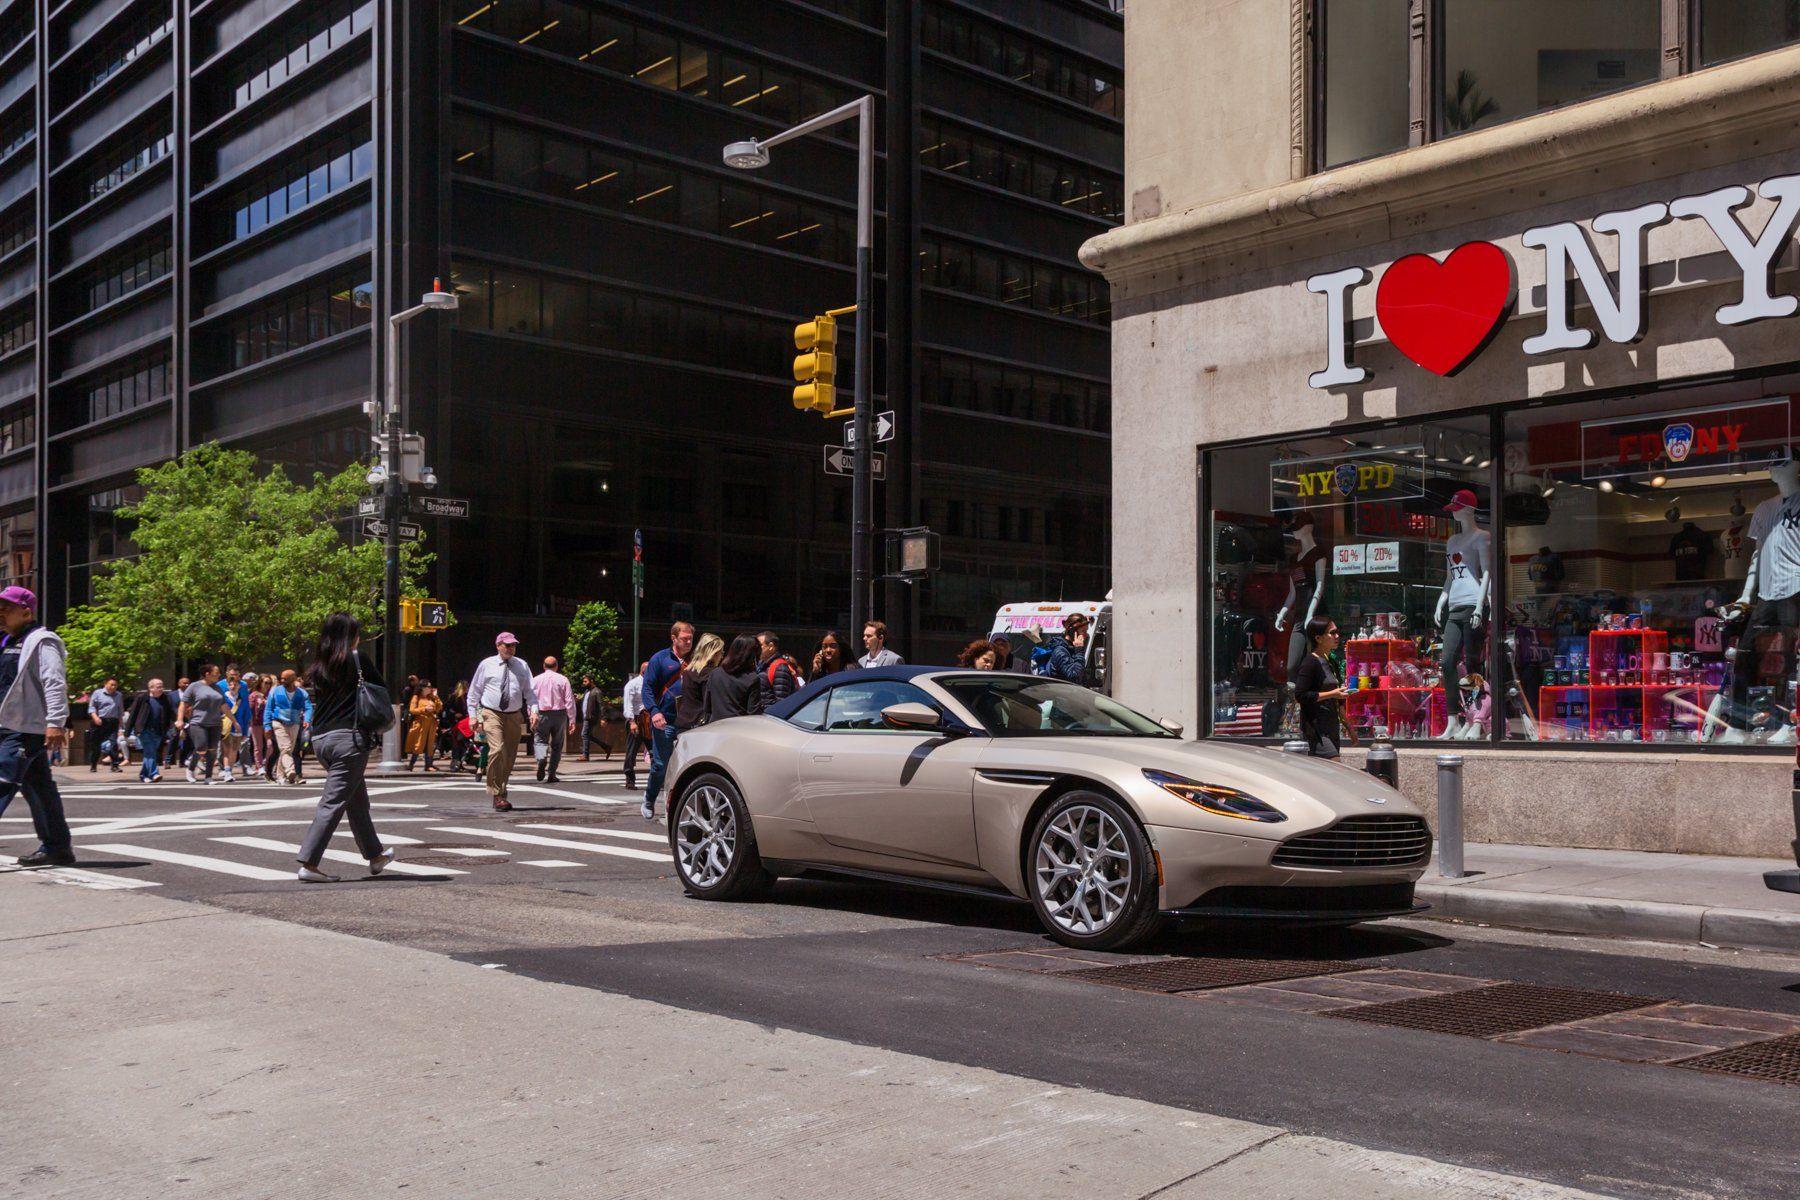 We drove an ultra stylish $273 244 Aston Martin DB11 Volante